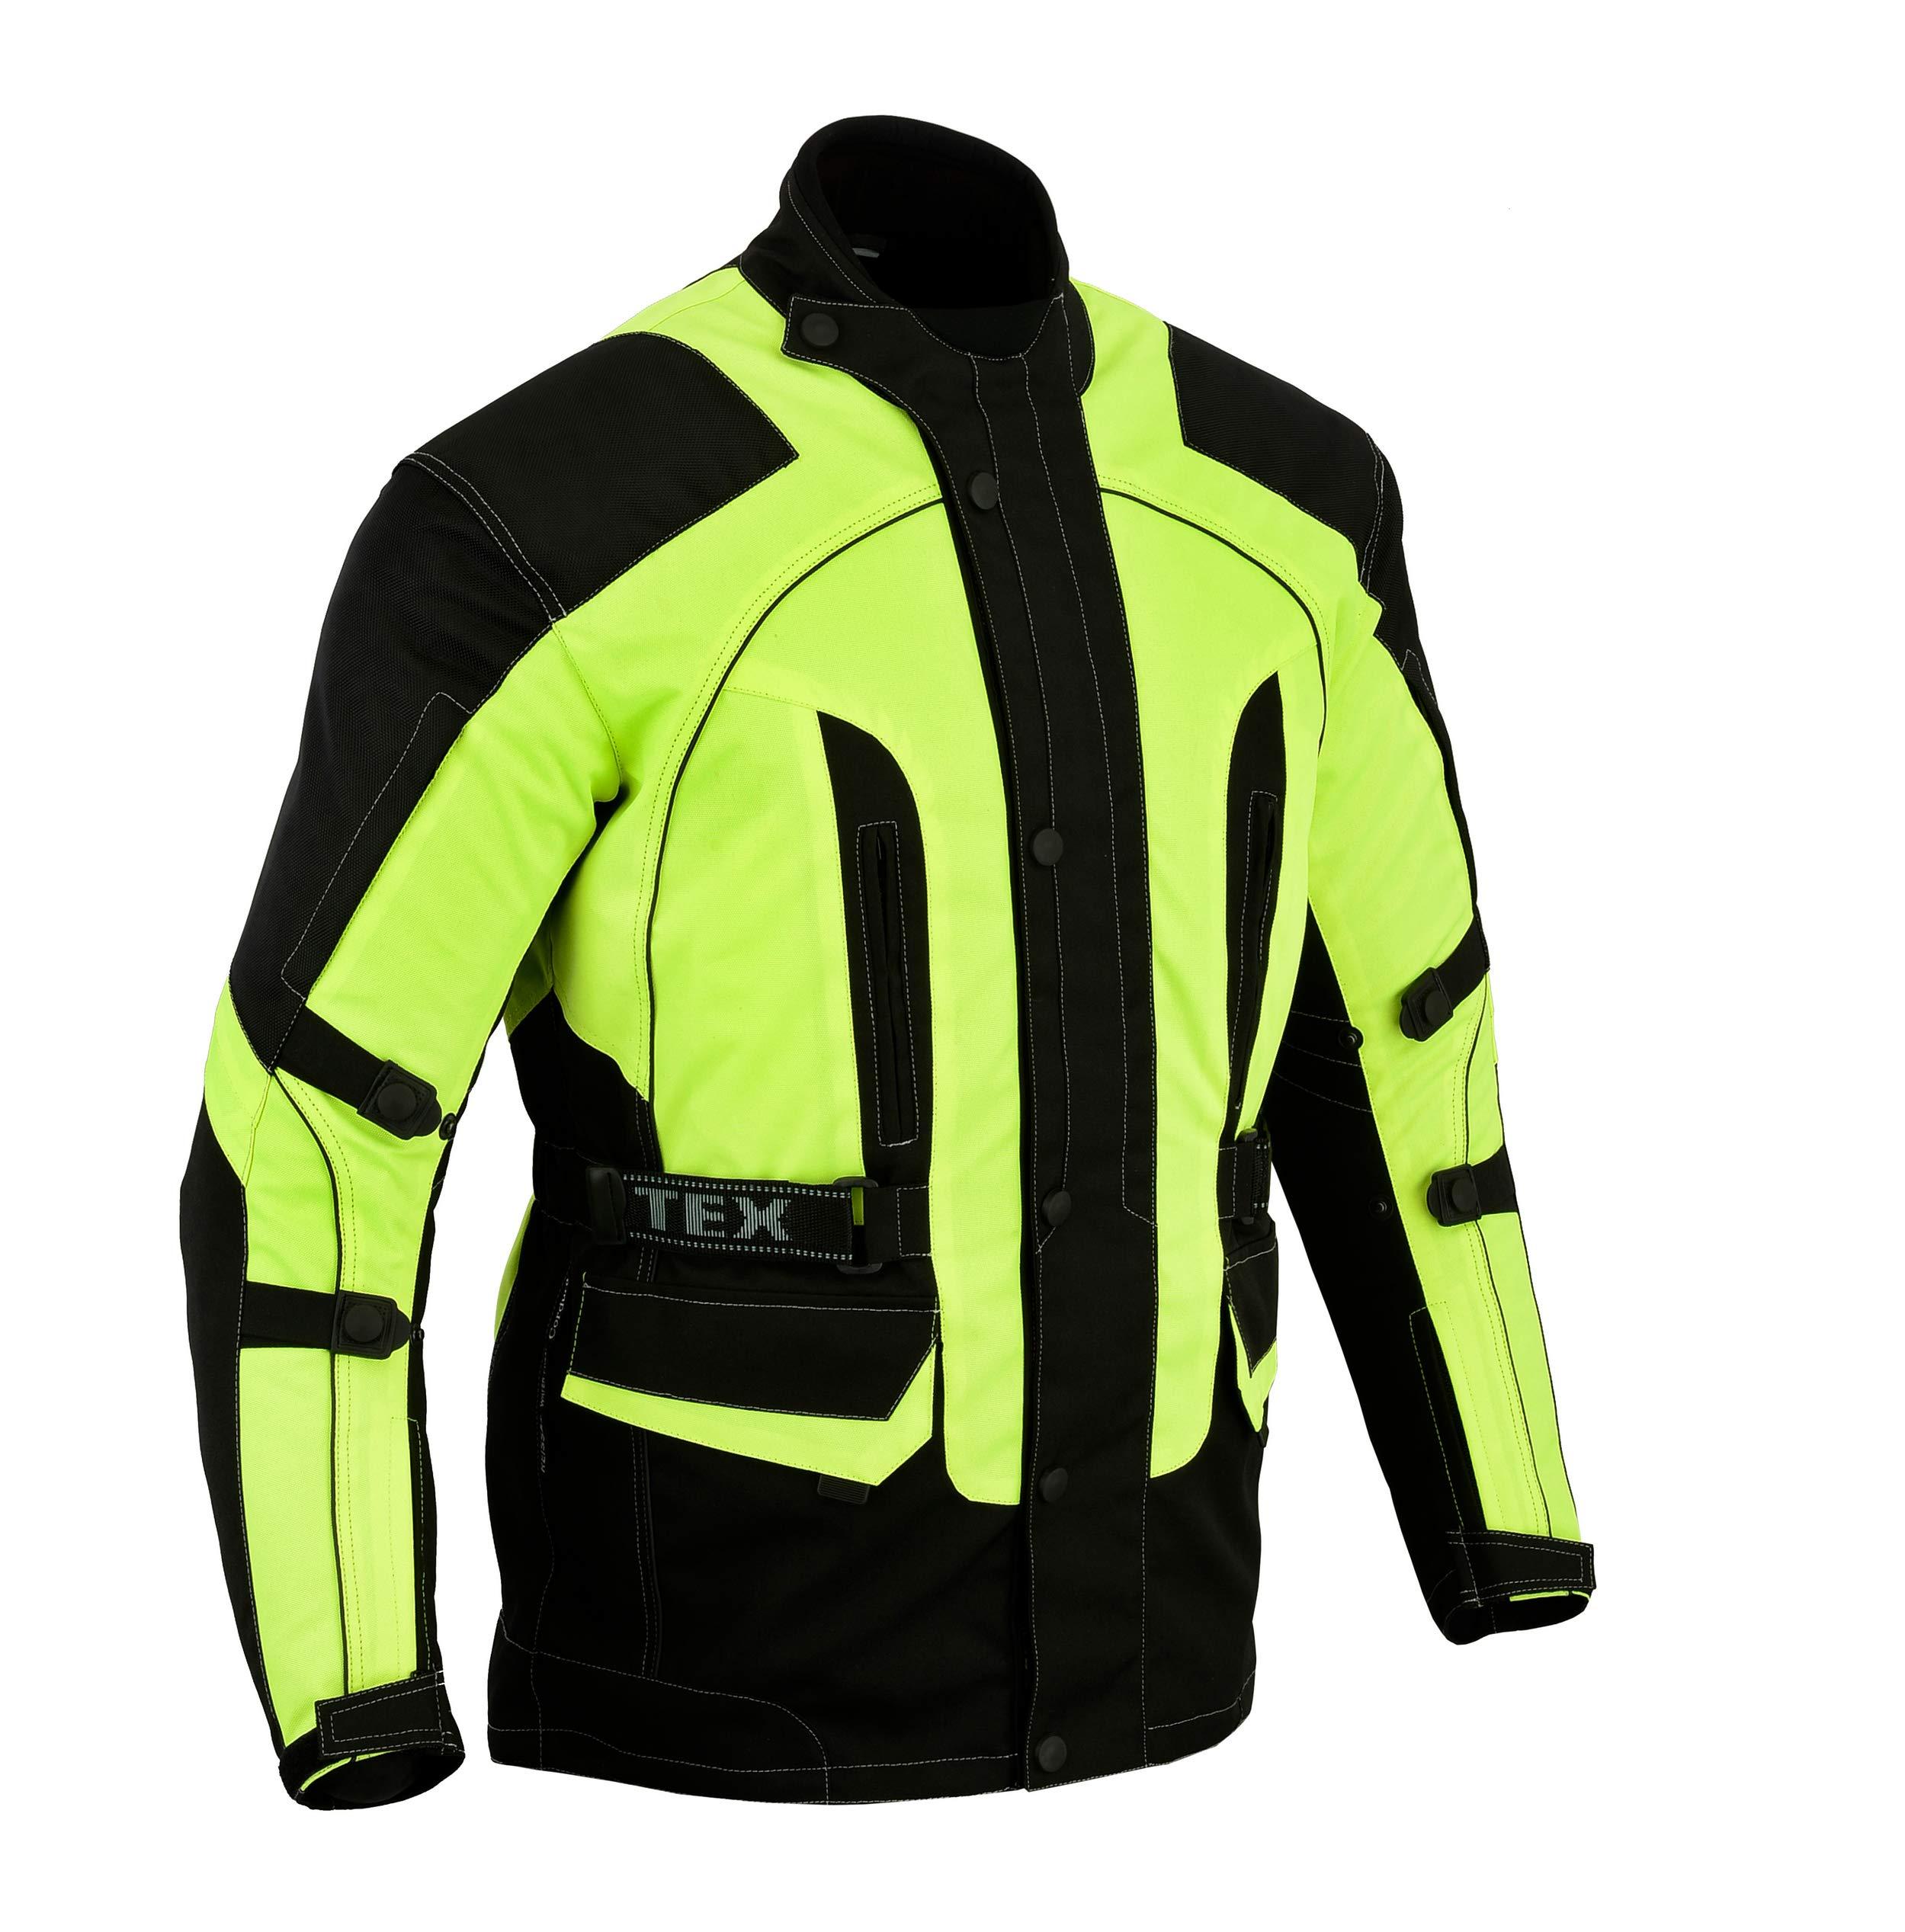 Mens Motorcycle Motorbike Textile CE Armoured Waterproof Trousers Pants Black//Fluro, W48 L32